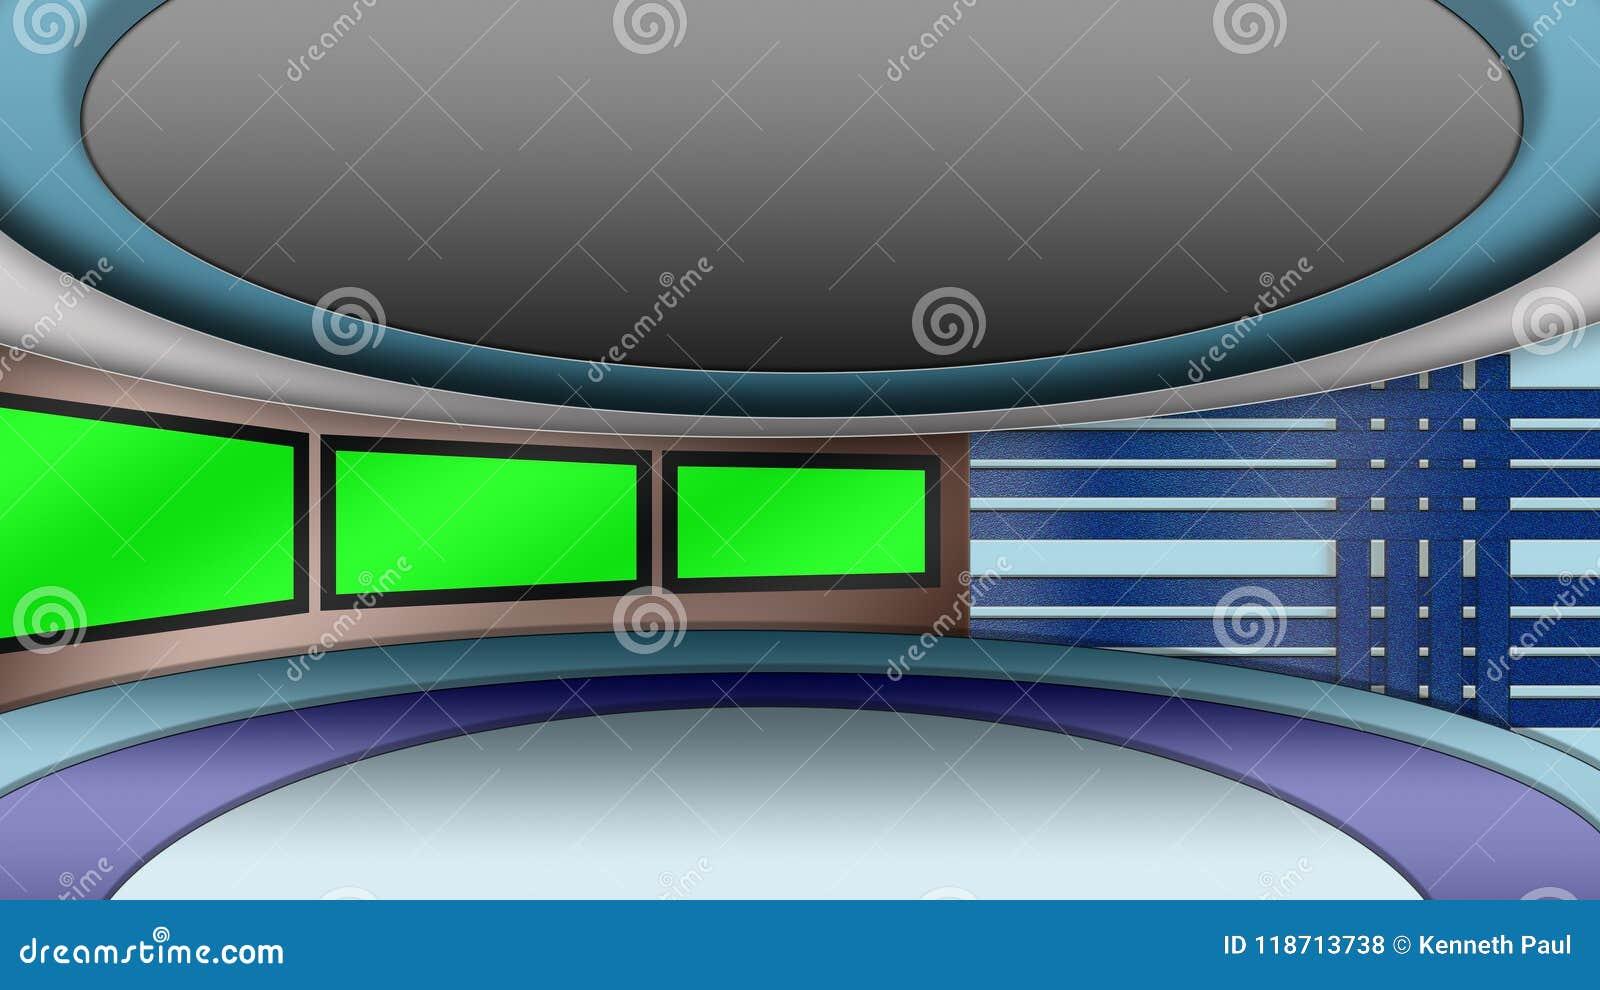 Virtual TV News Studio Set With Green Screens Stock Illustration